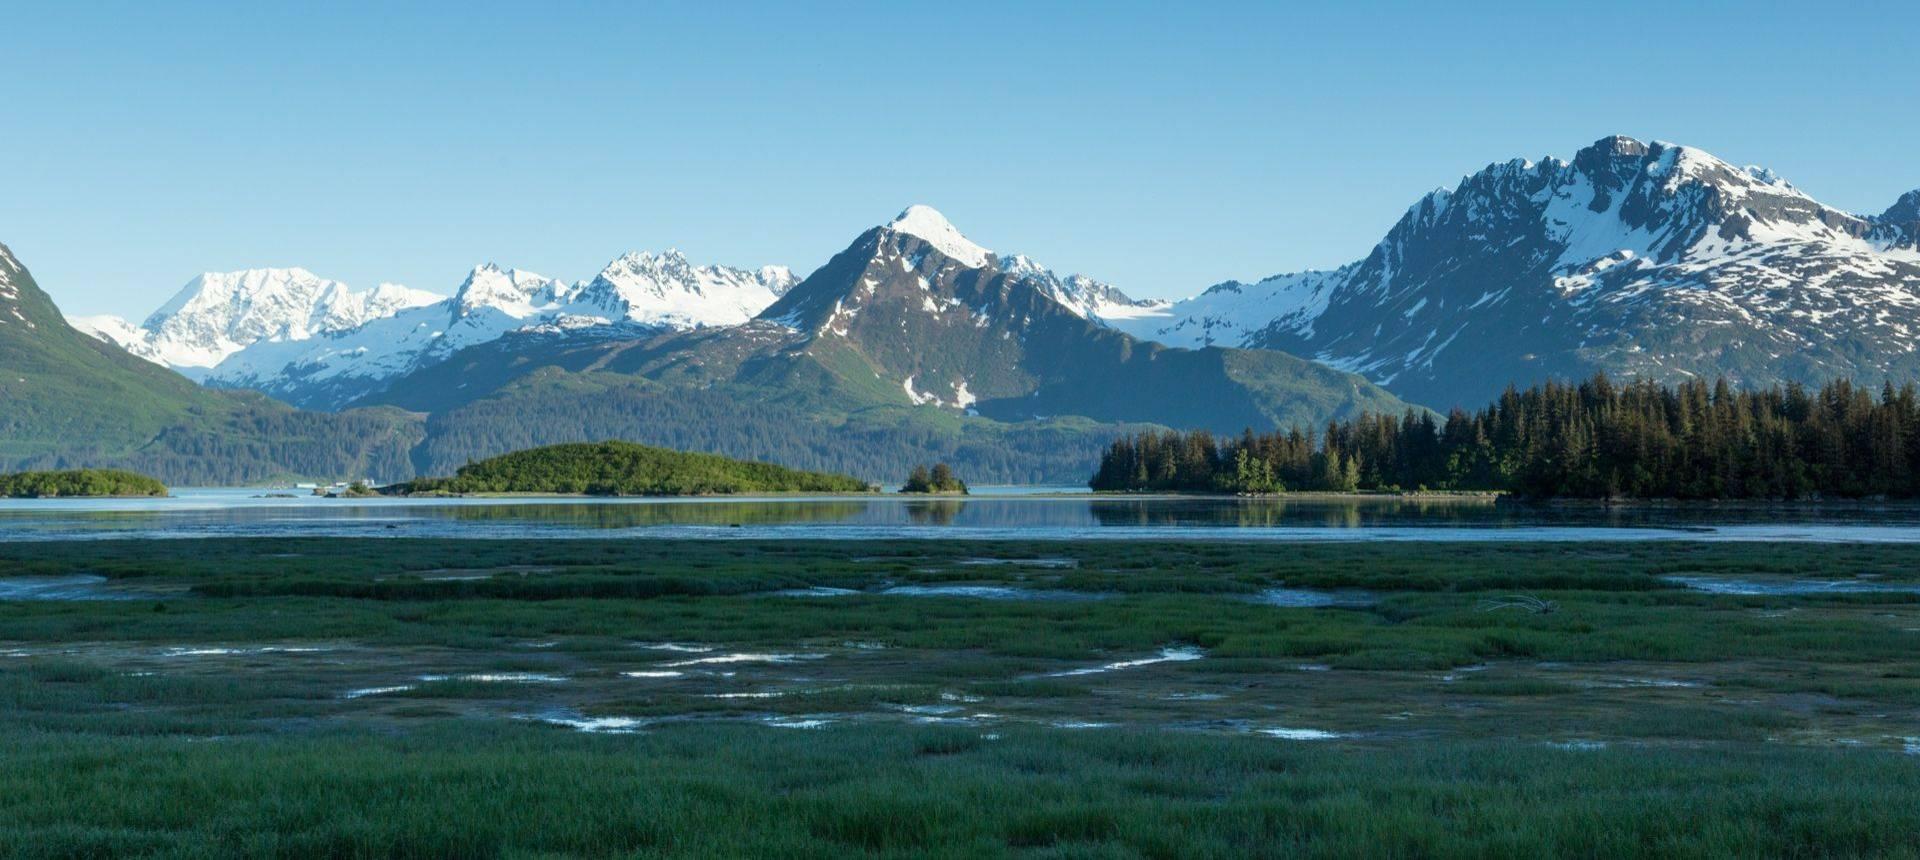 Prince William Sound Alaska Shutterstock 240169987